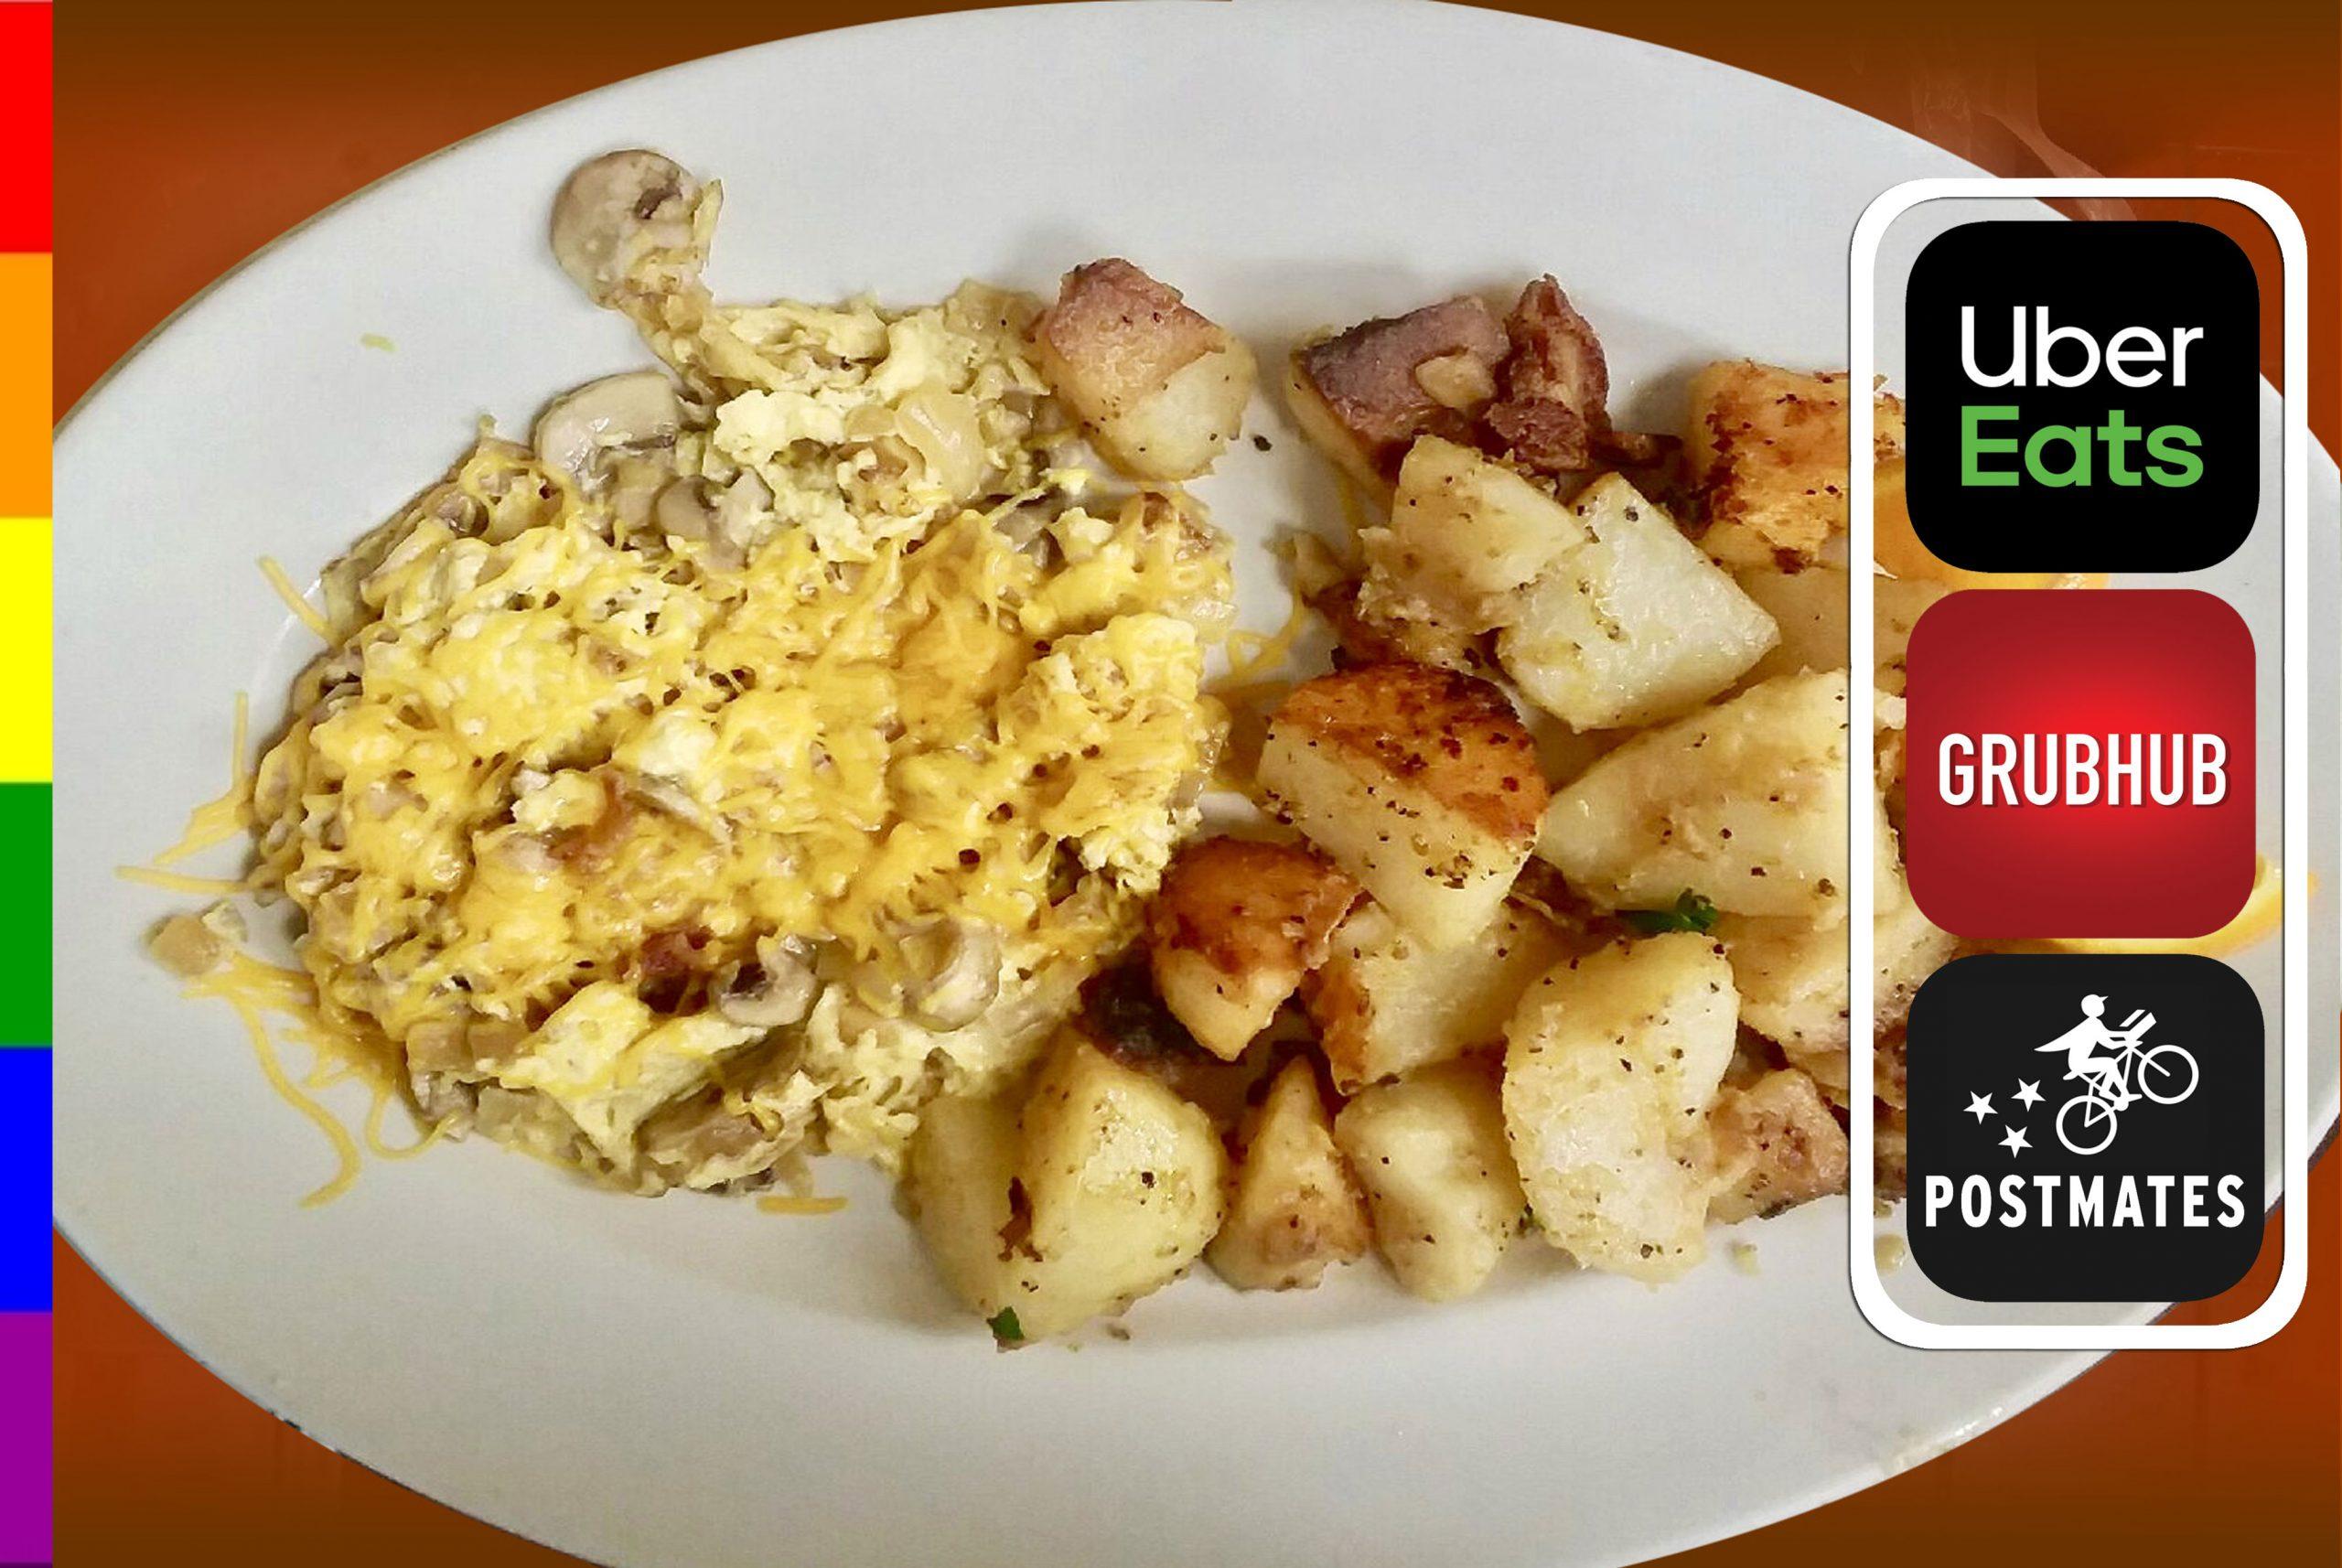 Mushroom, Onion & Cheese Omelette